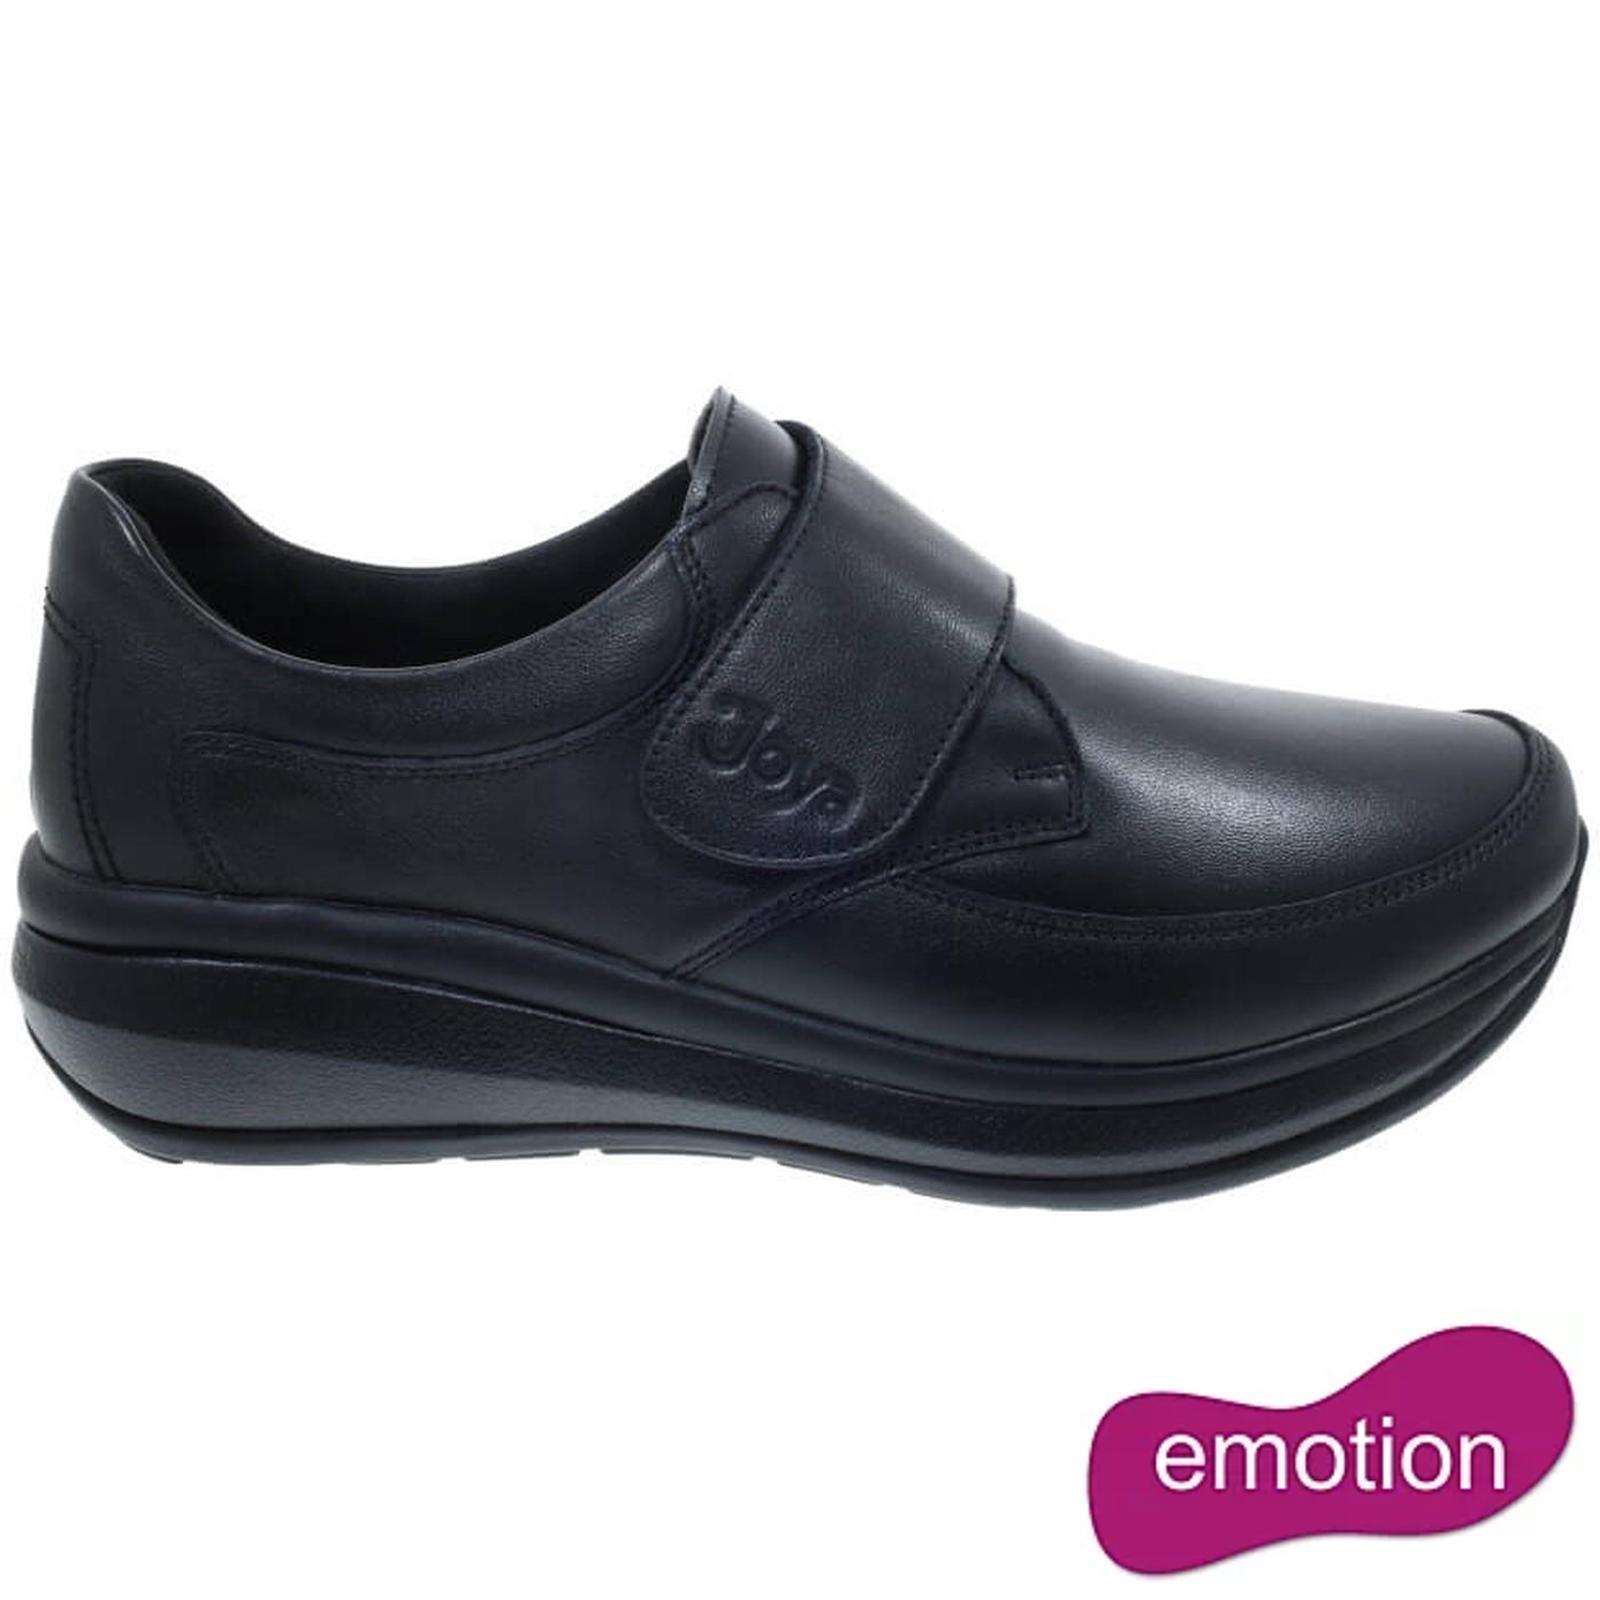 Joya Womens Relax Velcro Leather Shoes - Black